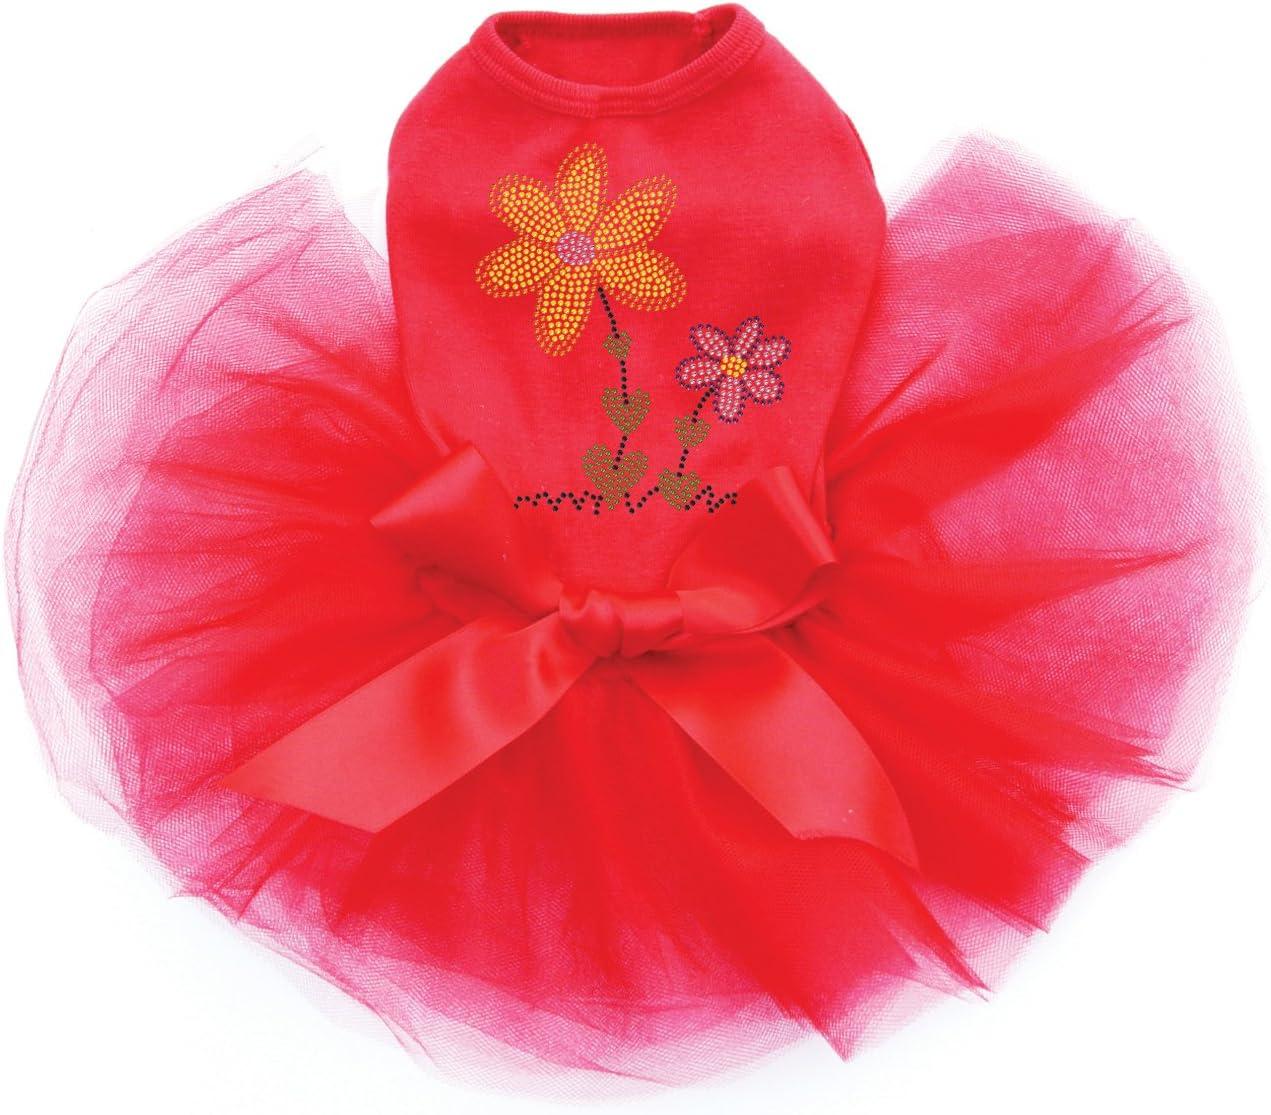 Orange Purple Flowers - Bling Award-winning store Limited price Rhinestone Re Dog XL Tutu Dress